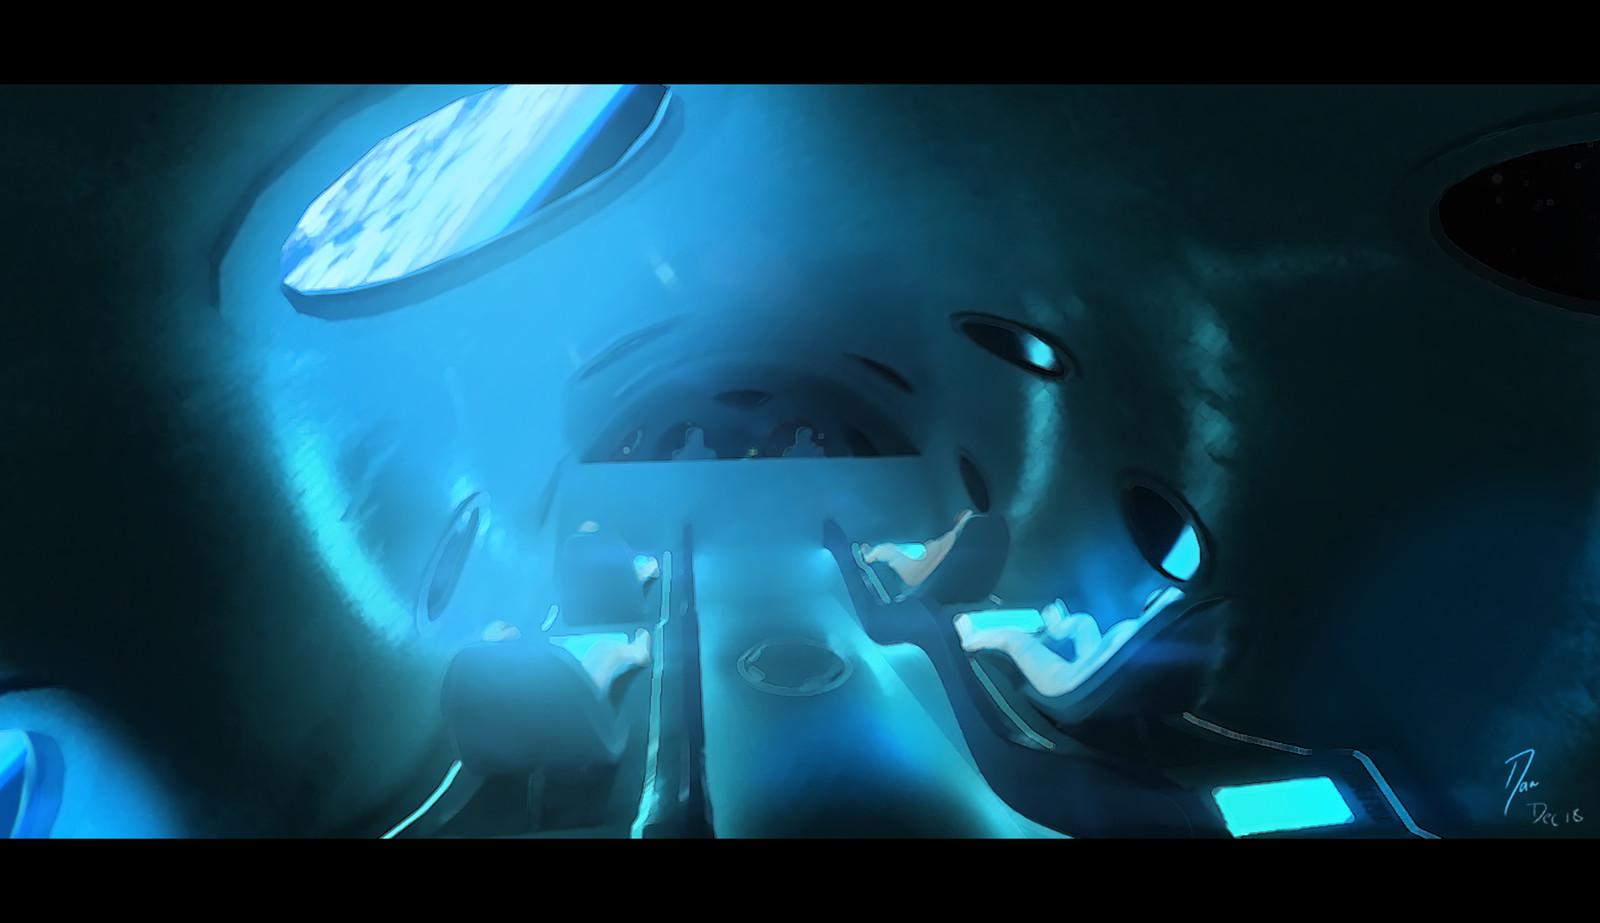 Space Tourist - Concept VR painting